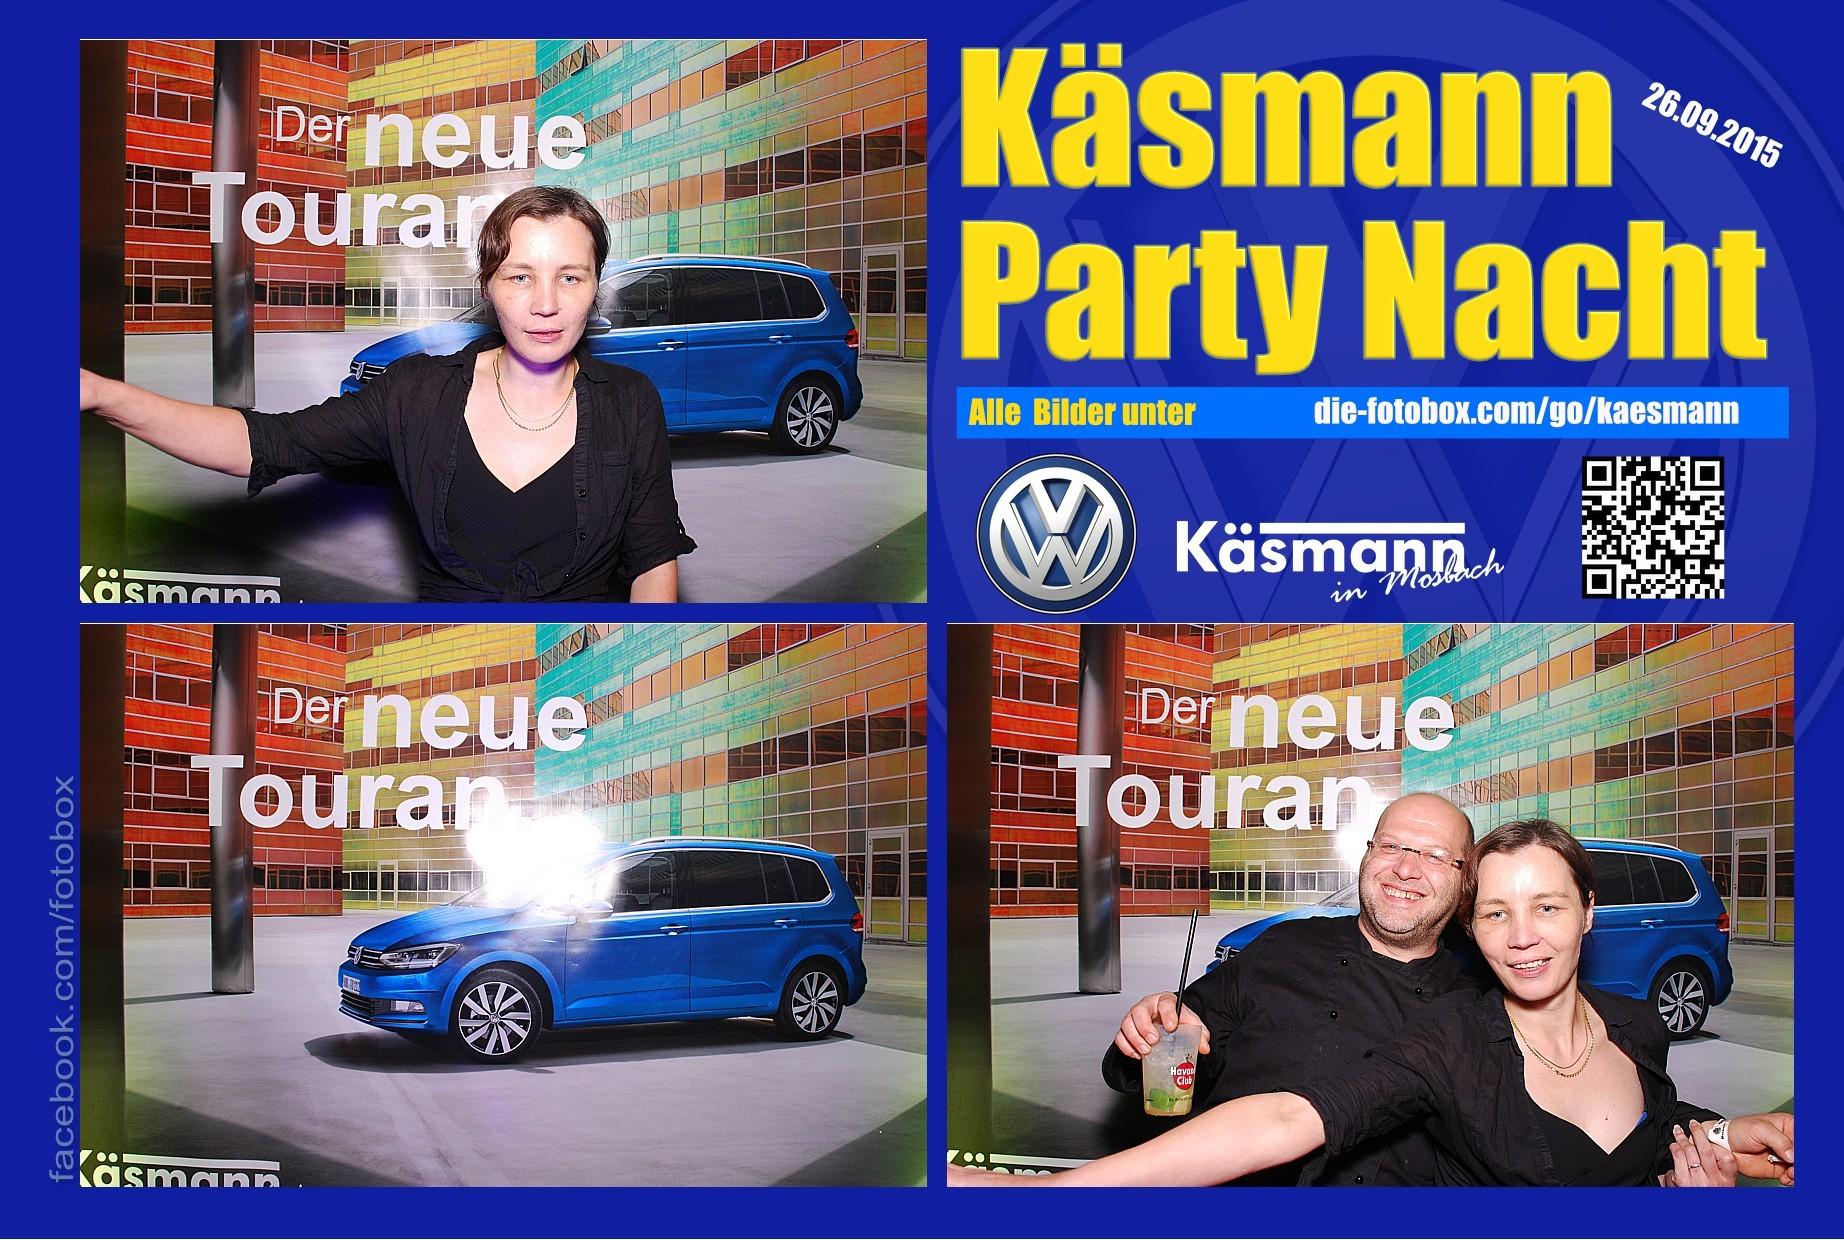 Käsmannparty 2015 - www.die-fotobox.com 01296